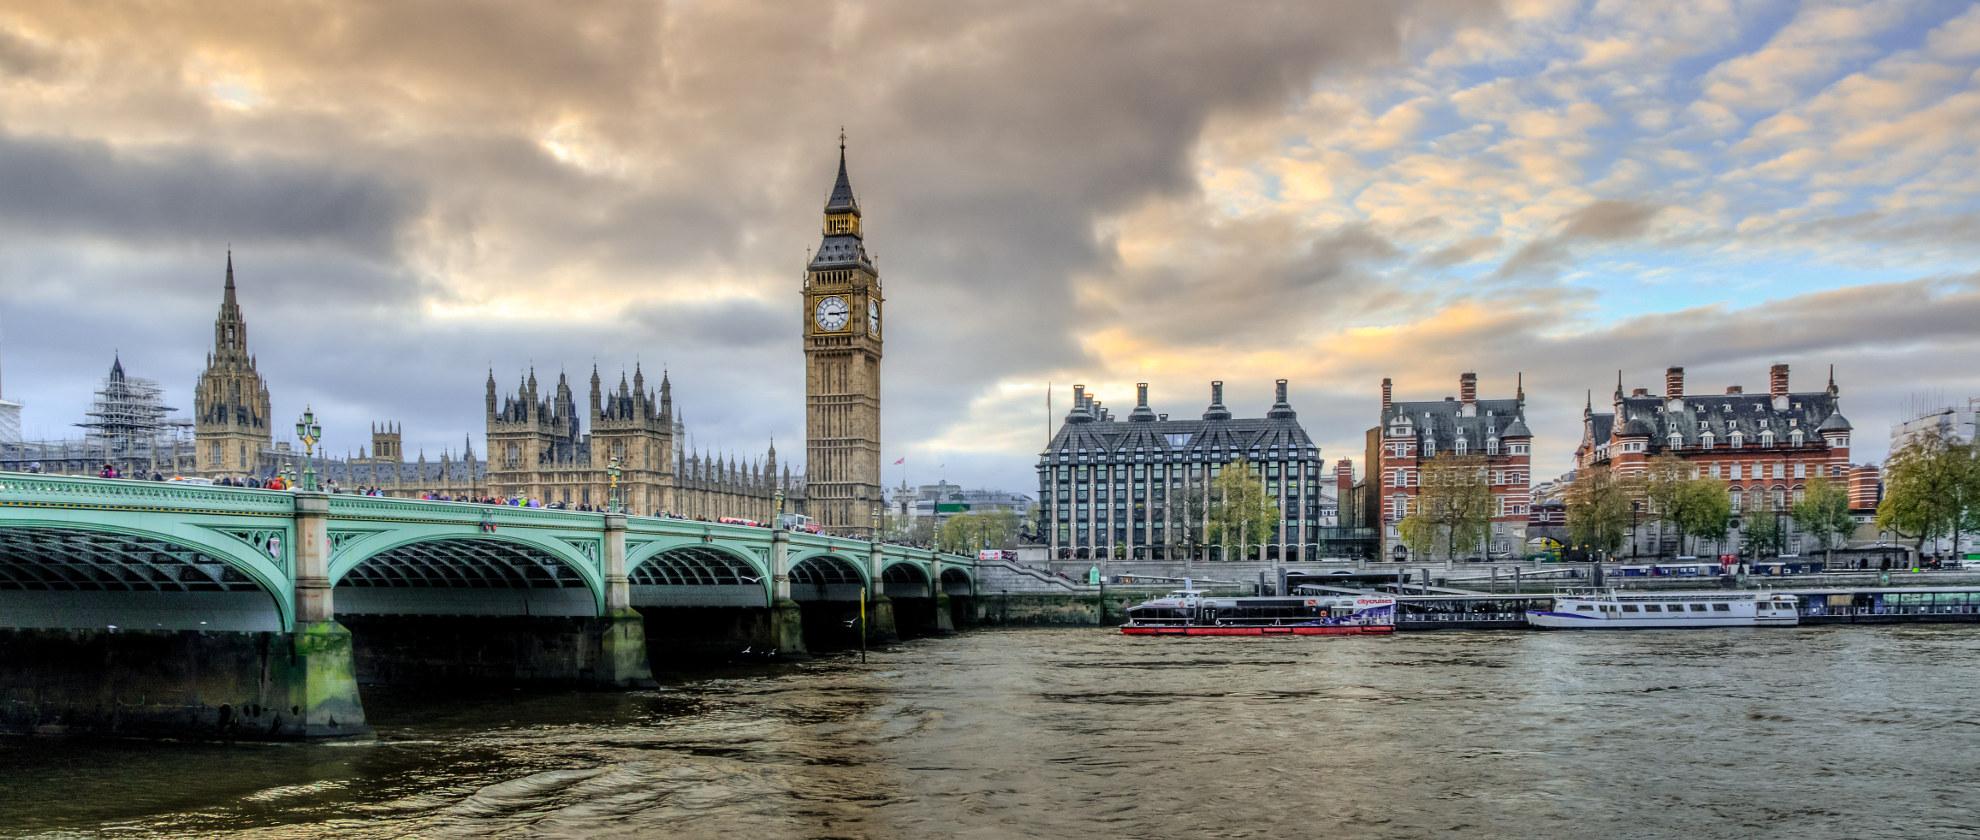 Vivienne Westwood & Sadiq Khan Name London Fashion Capital of the World